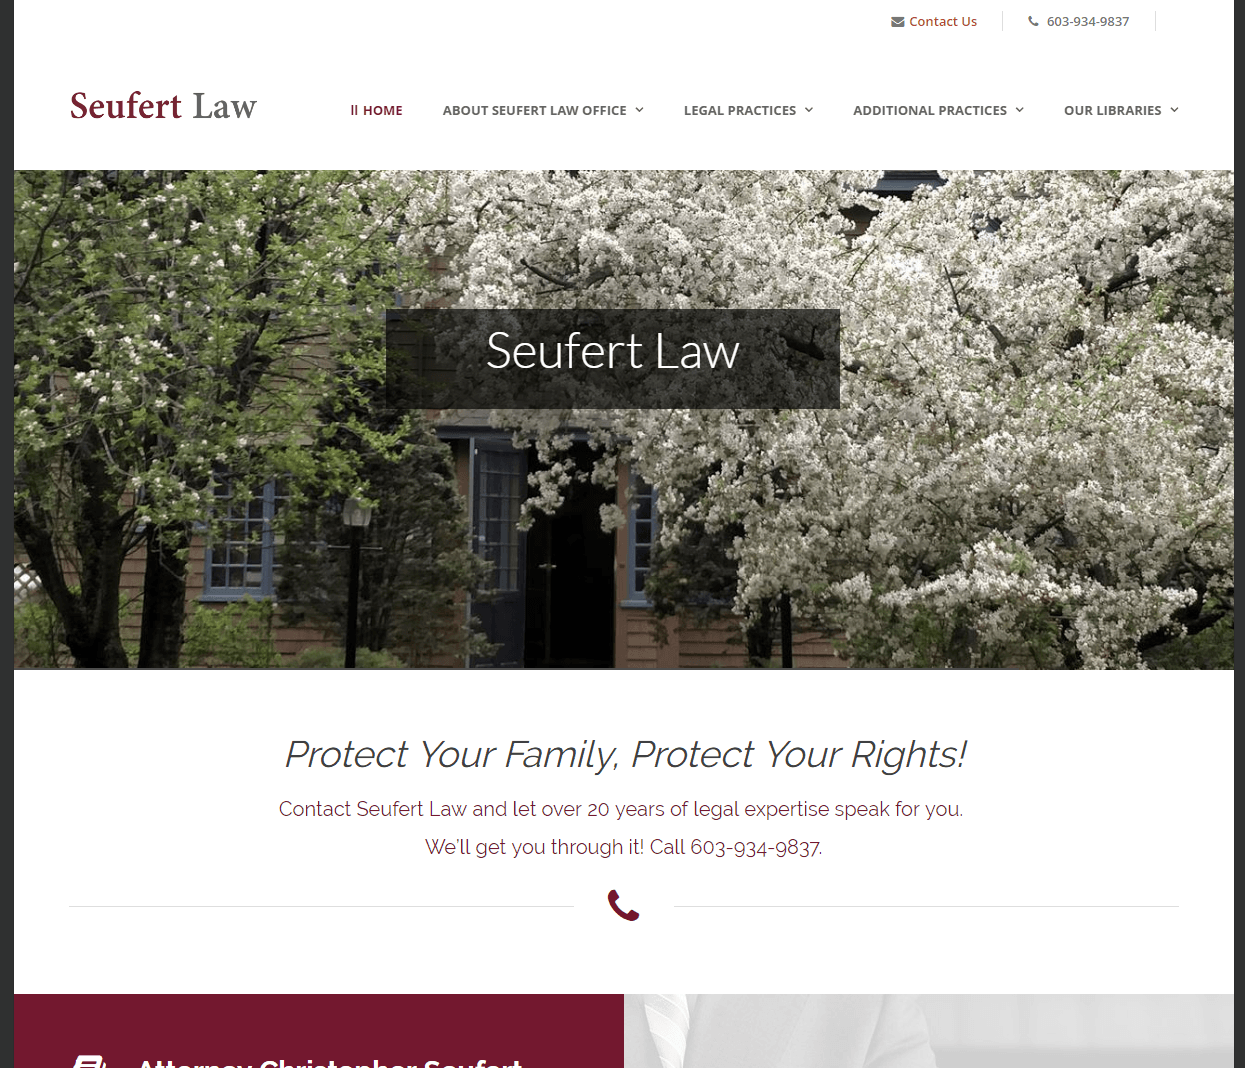 Seufert Law Homepage